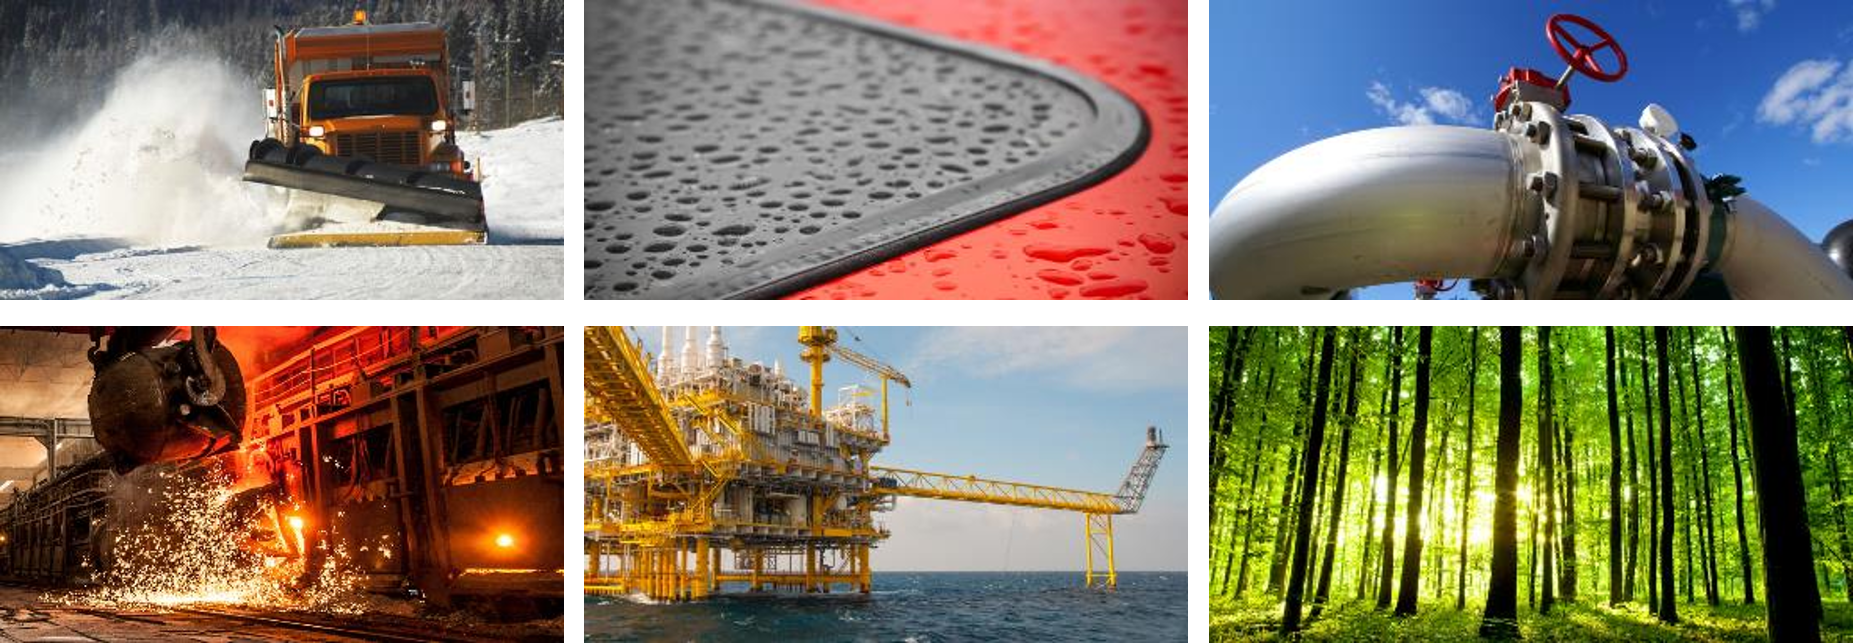 Benefits of DOWSIL™ Silicone Adhesives and Sealants